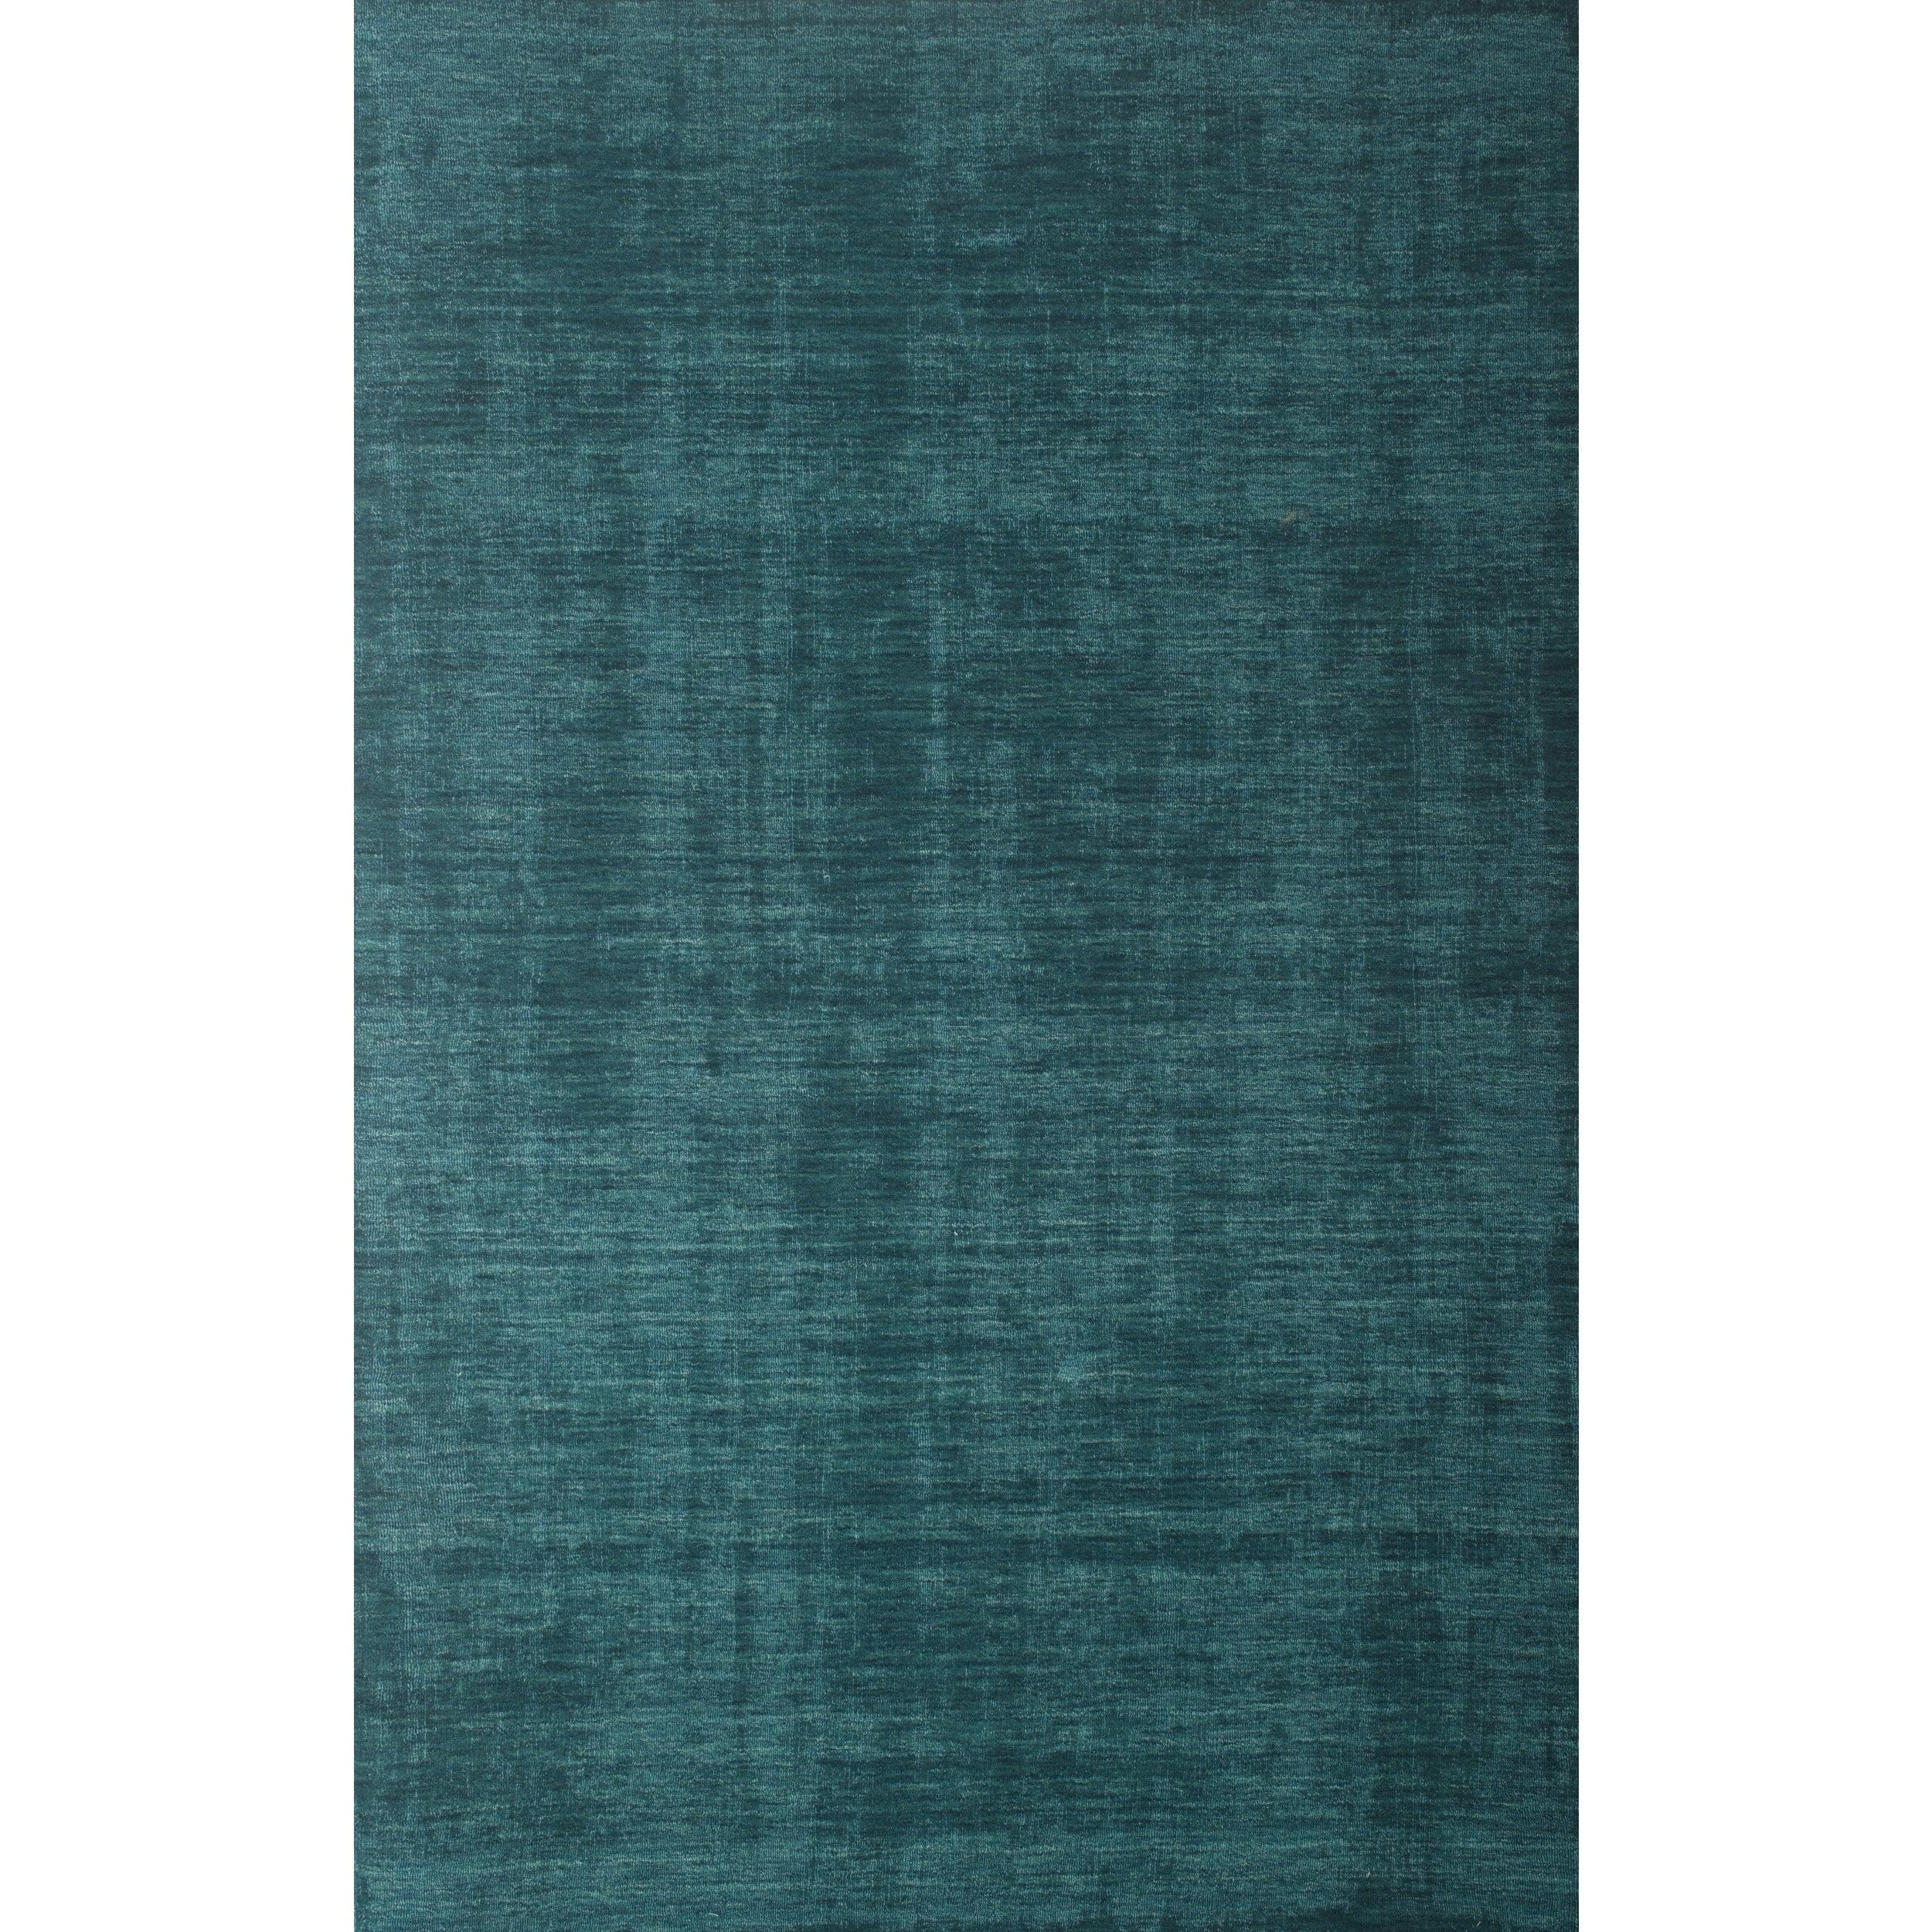 Bradley Teal Area Rug By Greyson Living (5' x 8') (Bradle...